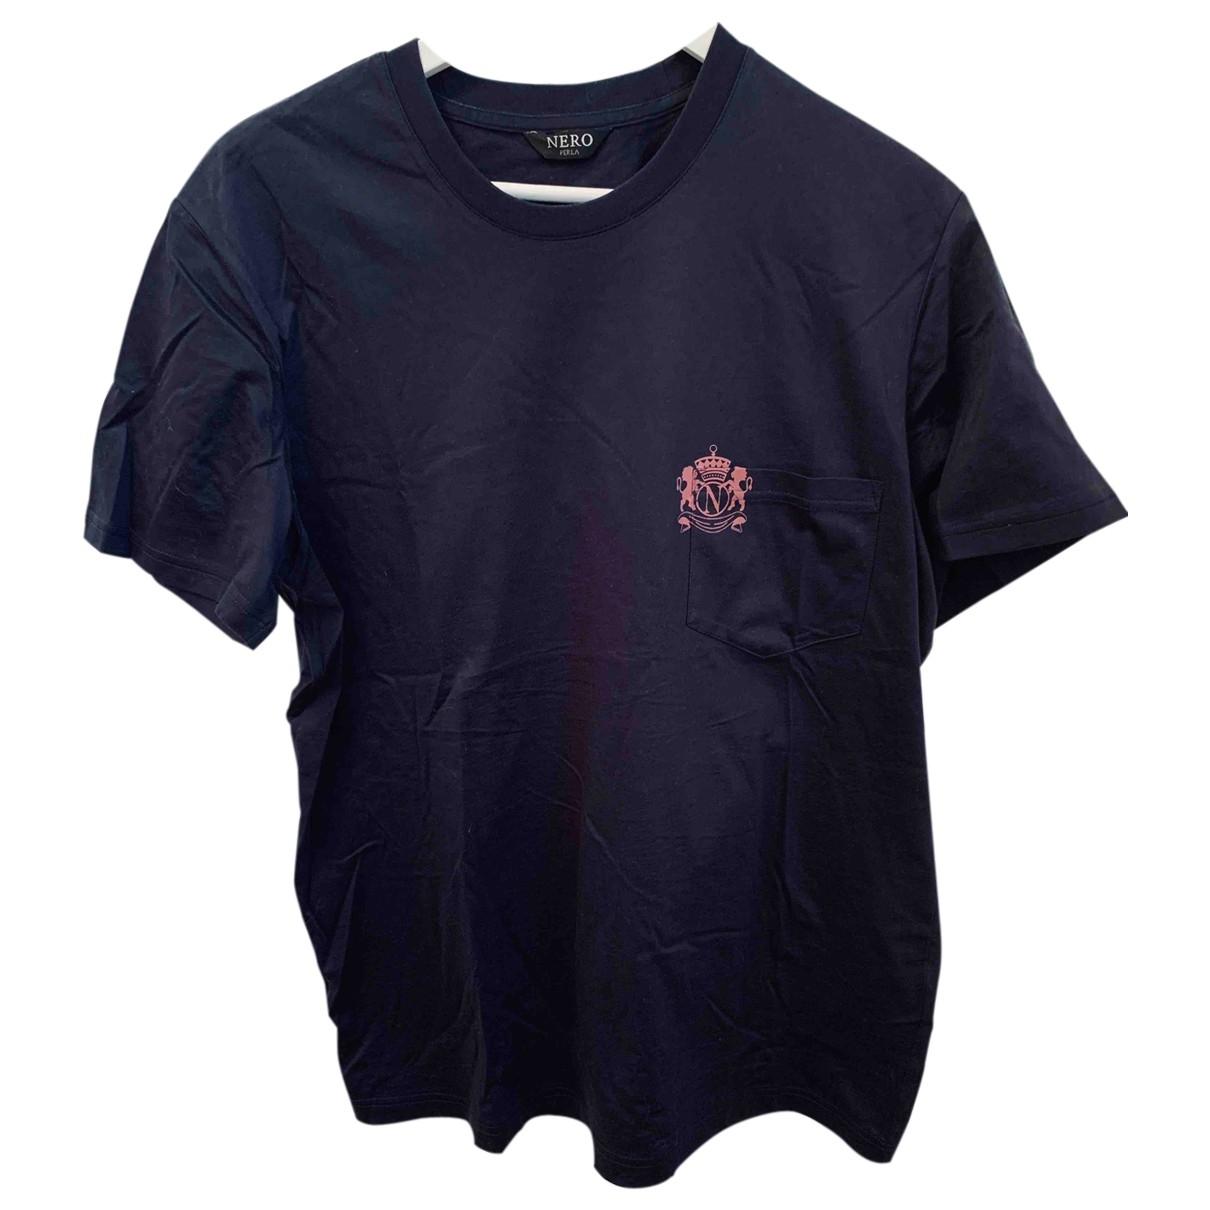 La Perla \N Navy Cotton T-shirts for Men L International